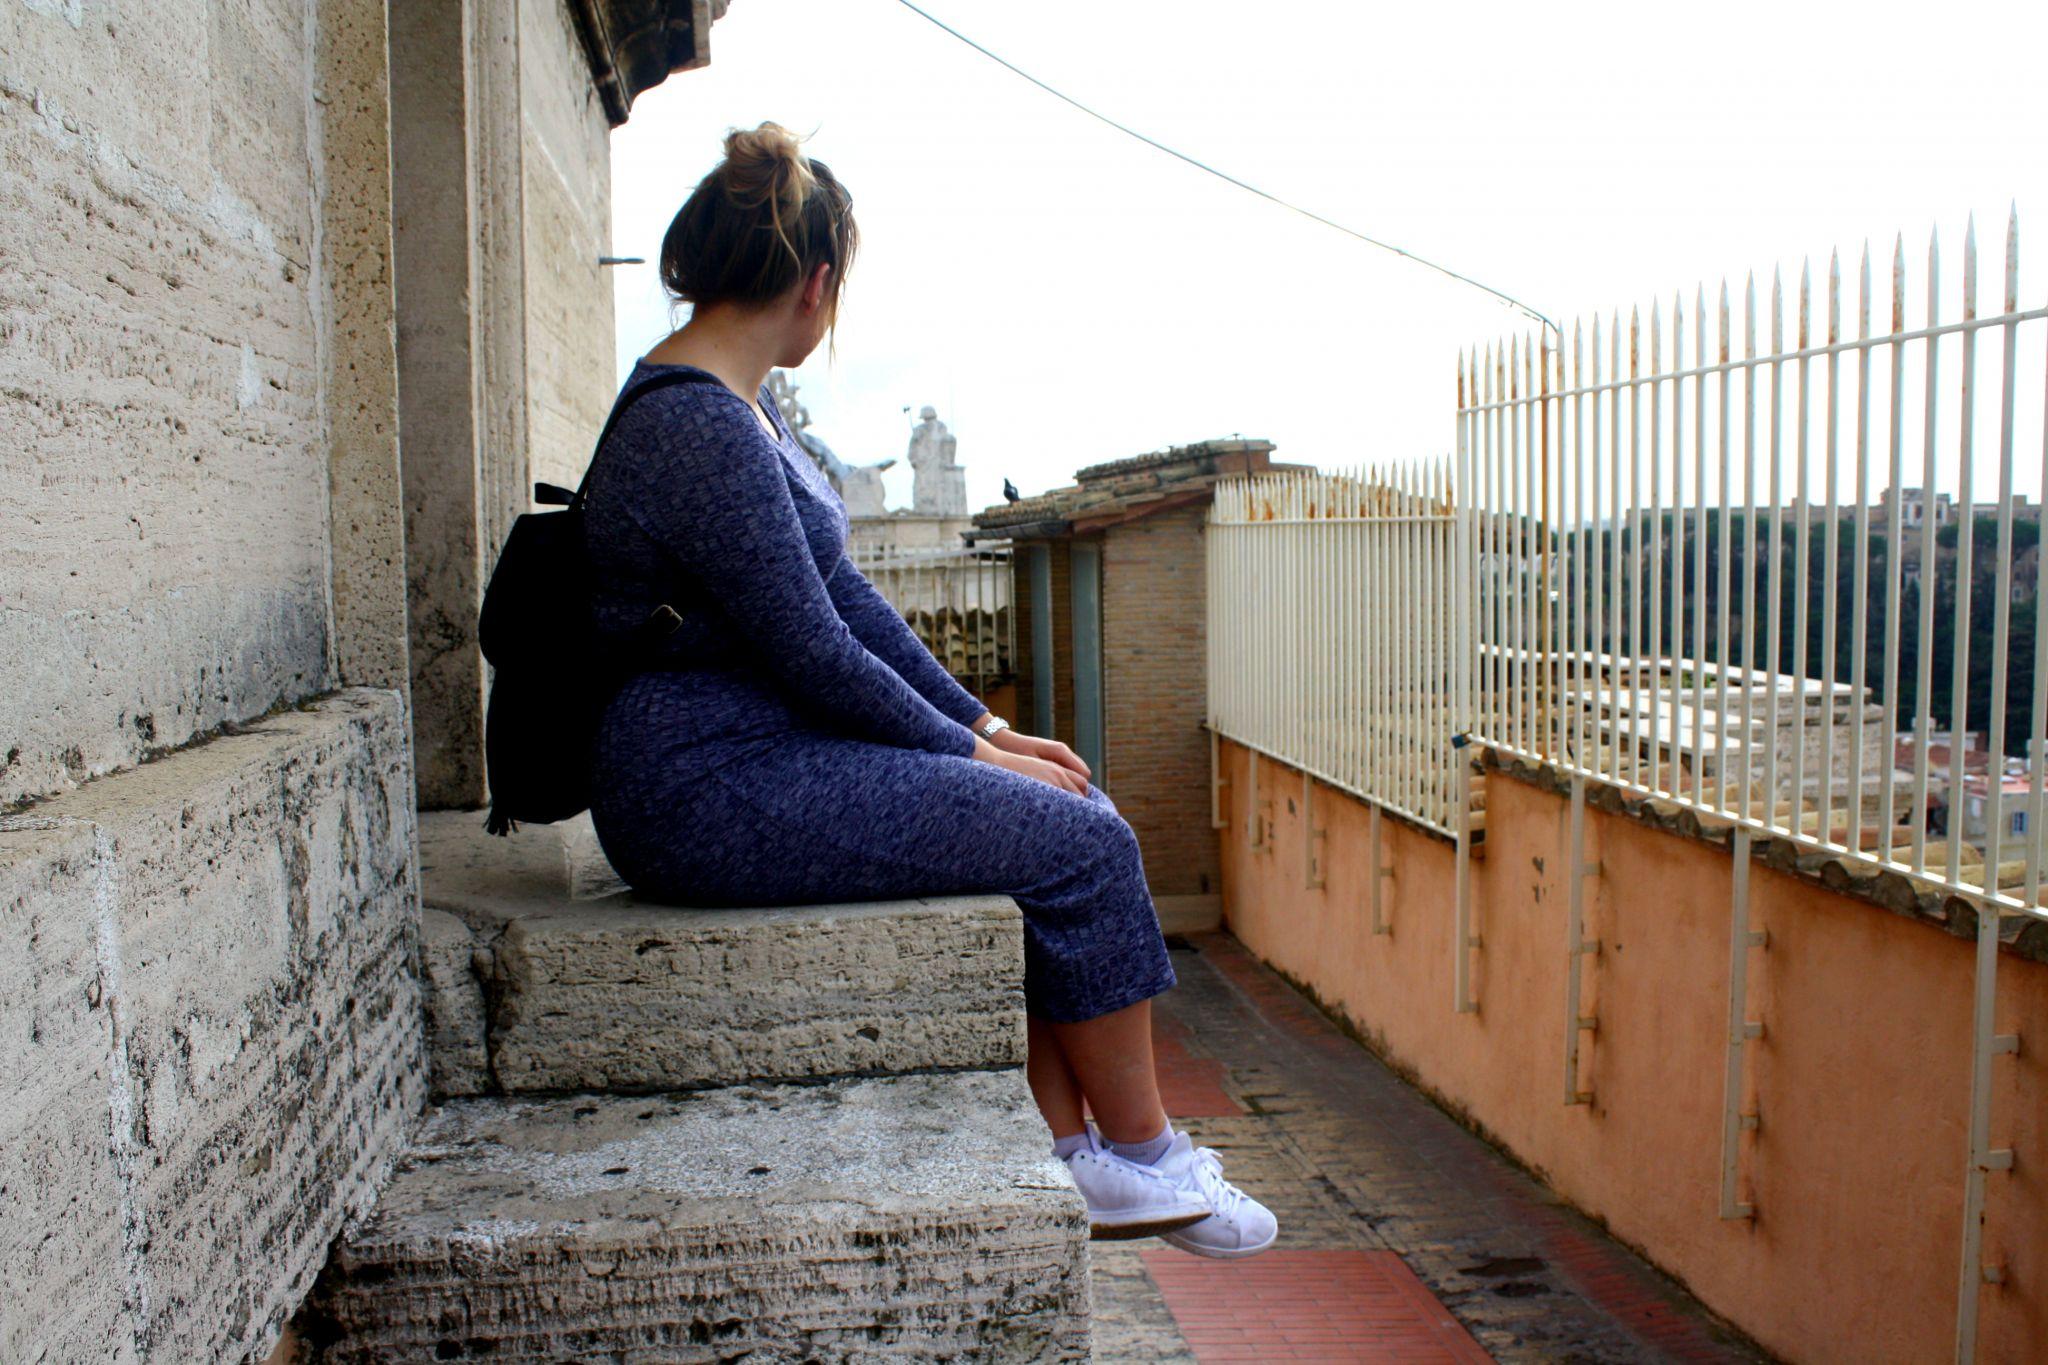 City, Violet Glenton, Simply Be, Rome